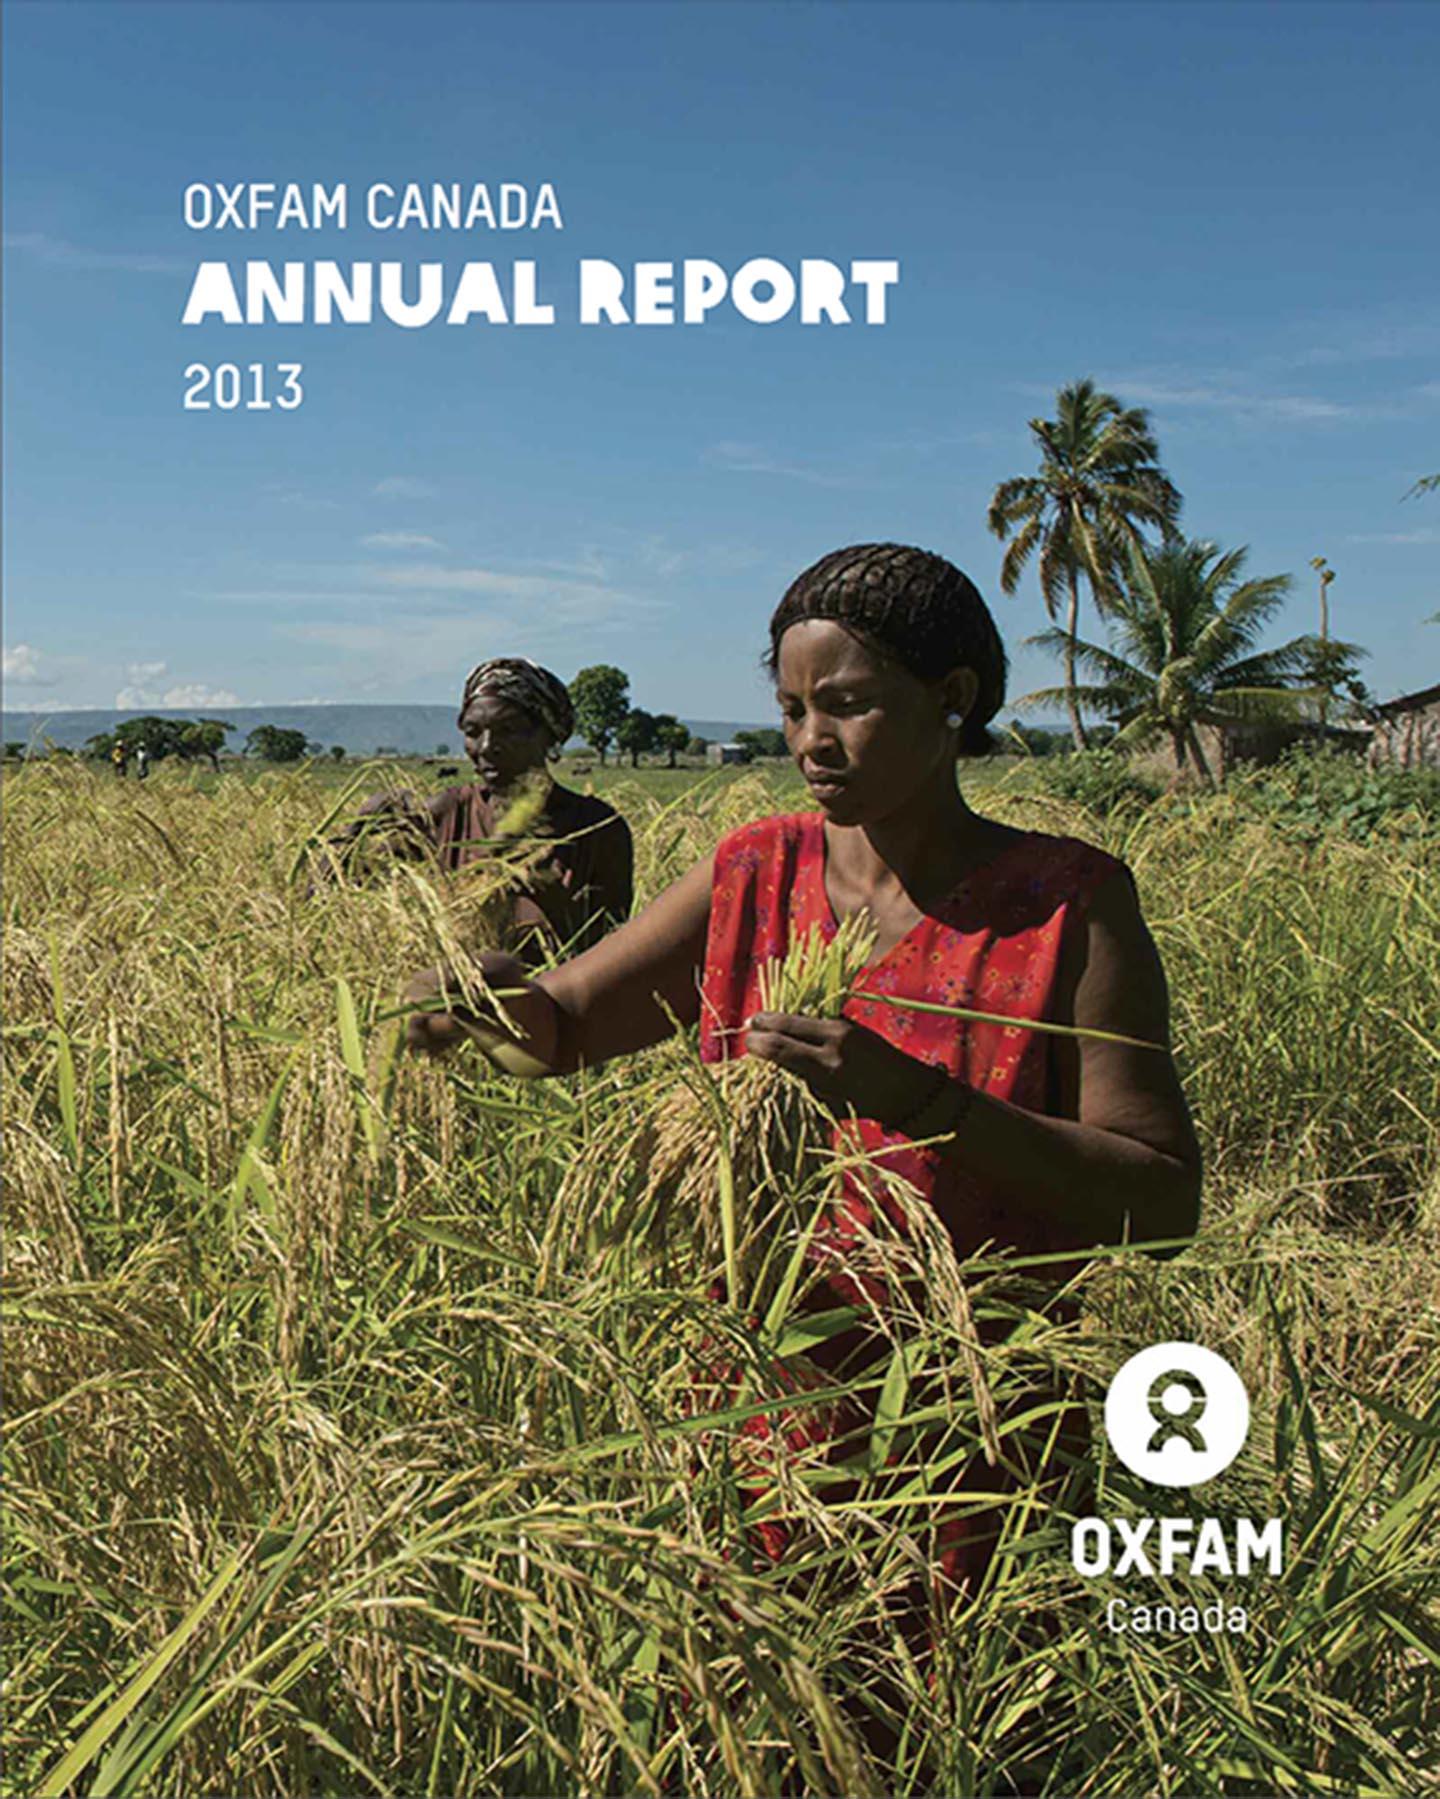 Oxfam Canada Annual Report Cover Shot.jpg